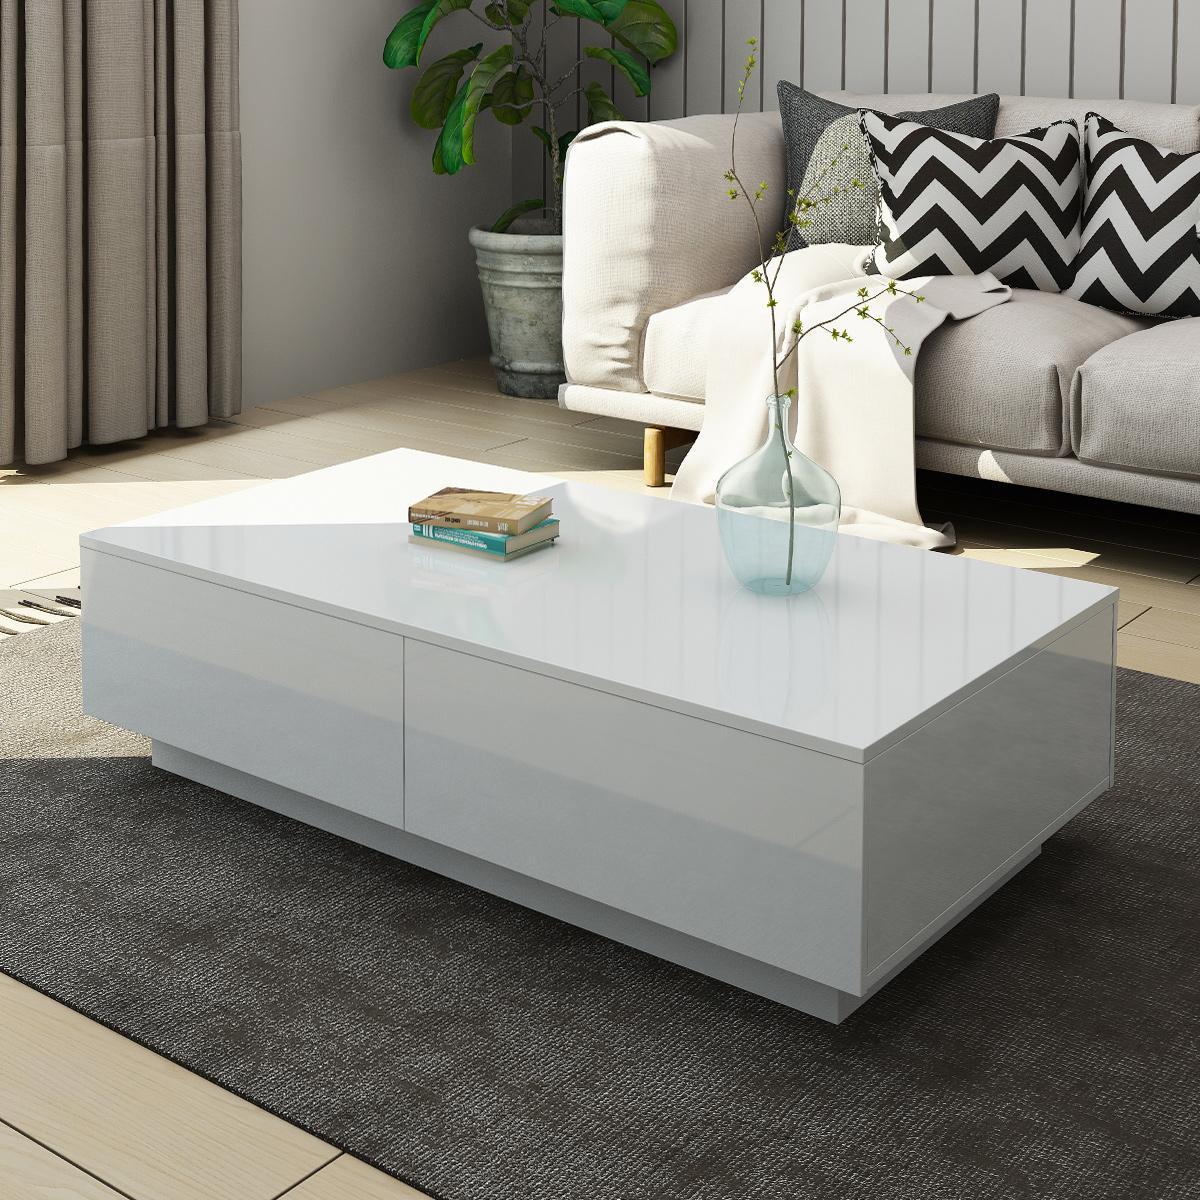 Modern Coffee Table 4 Drawer Storage Shelf High Gloss Wood Living Room Furniture White Matt Blatt